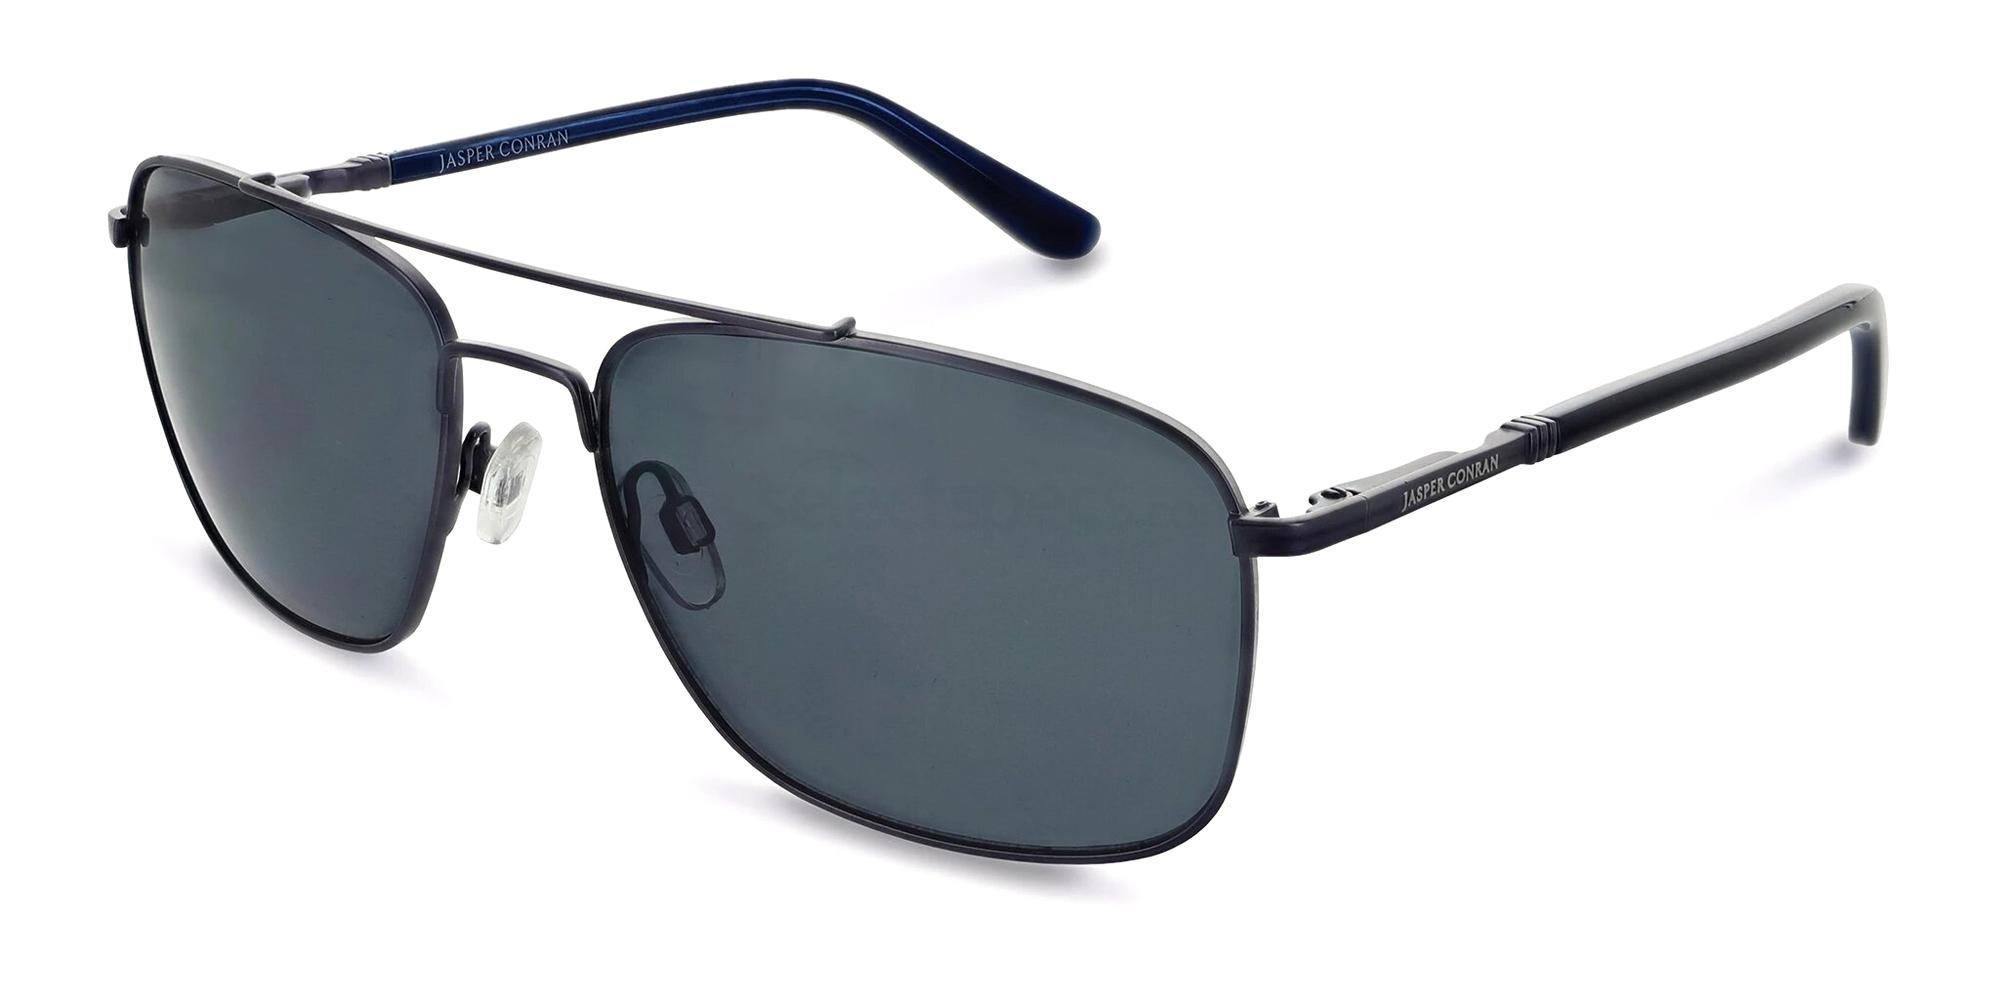 C2 JCMSUN01 Sunglasses, Jasper Conran